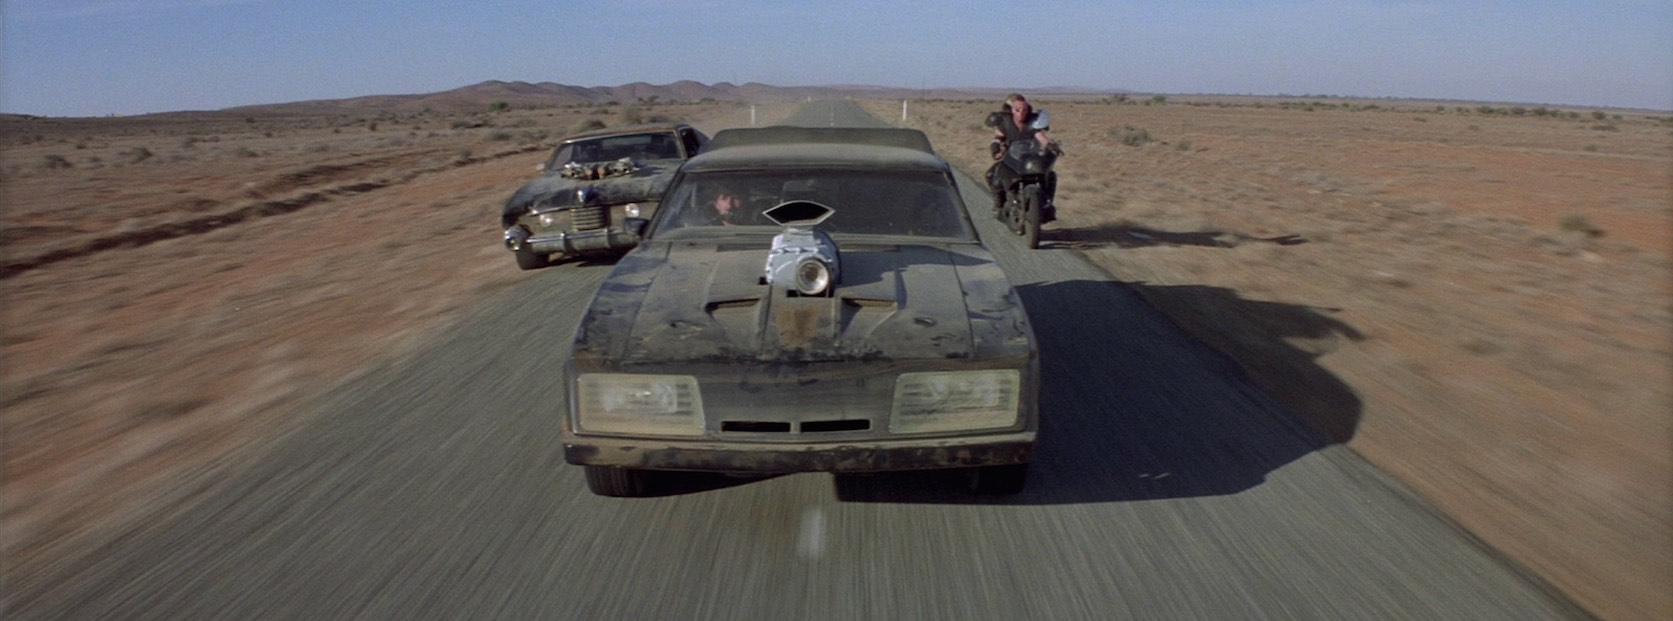 The Road Warrior Vs Mad Max Fury Road Filmic